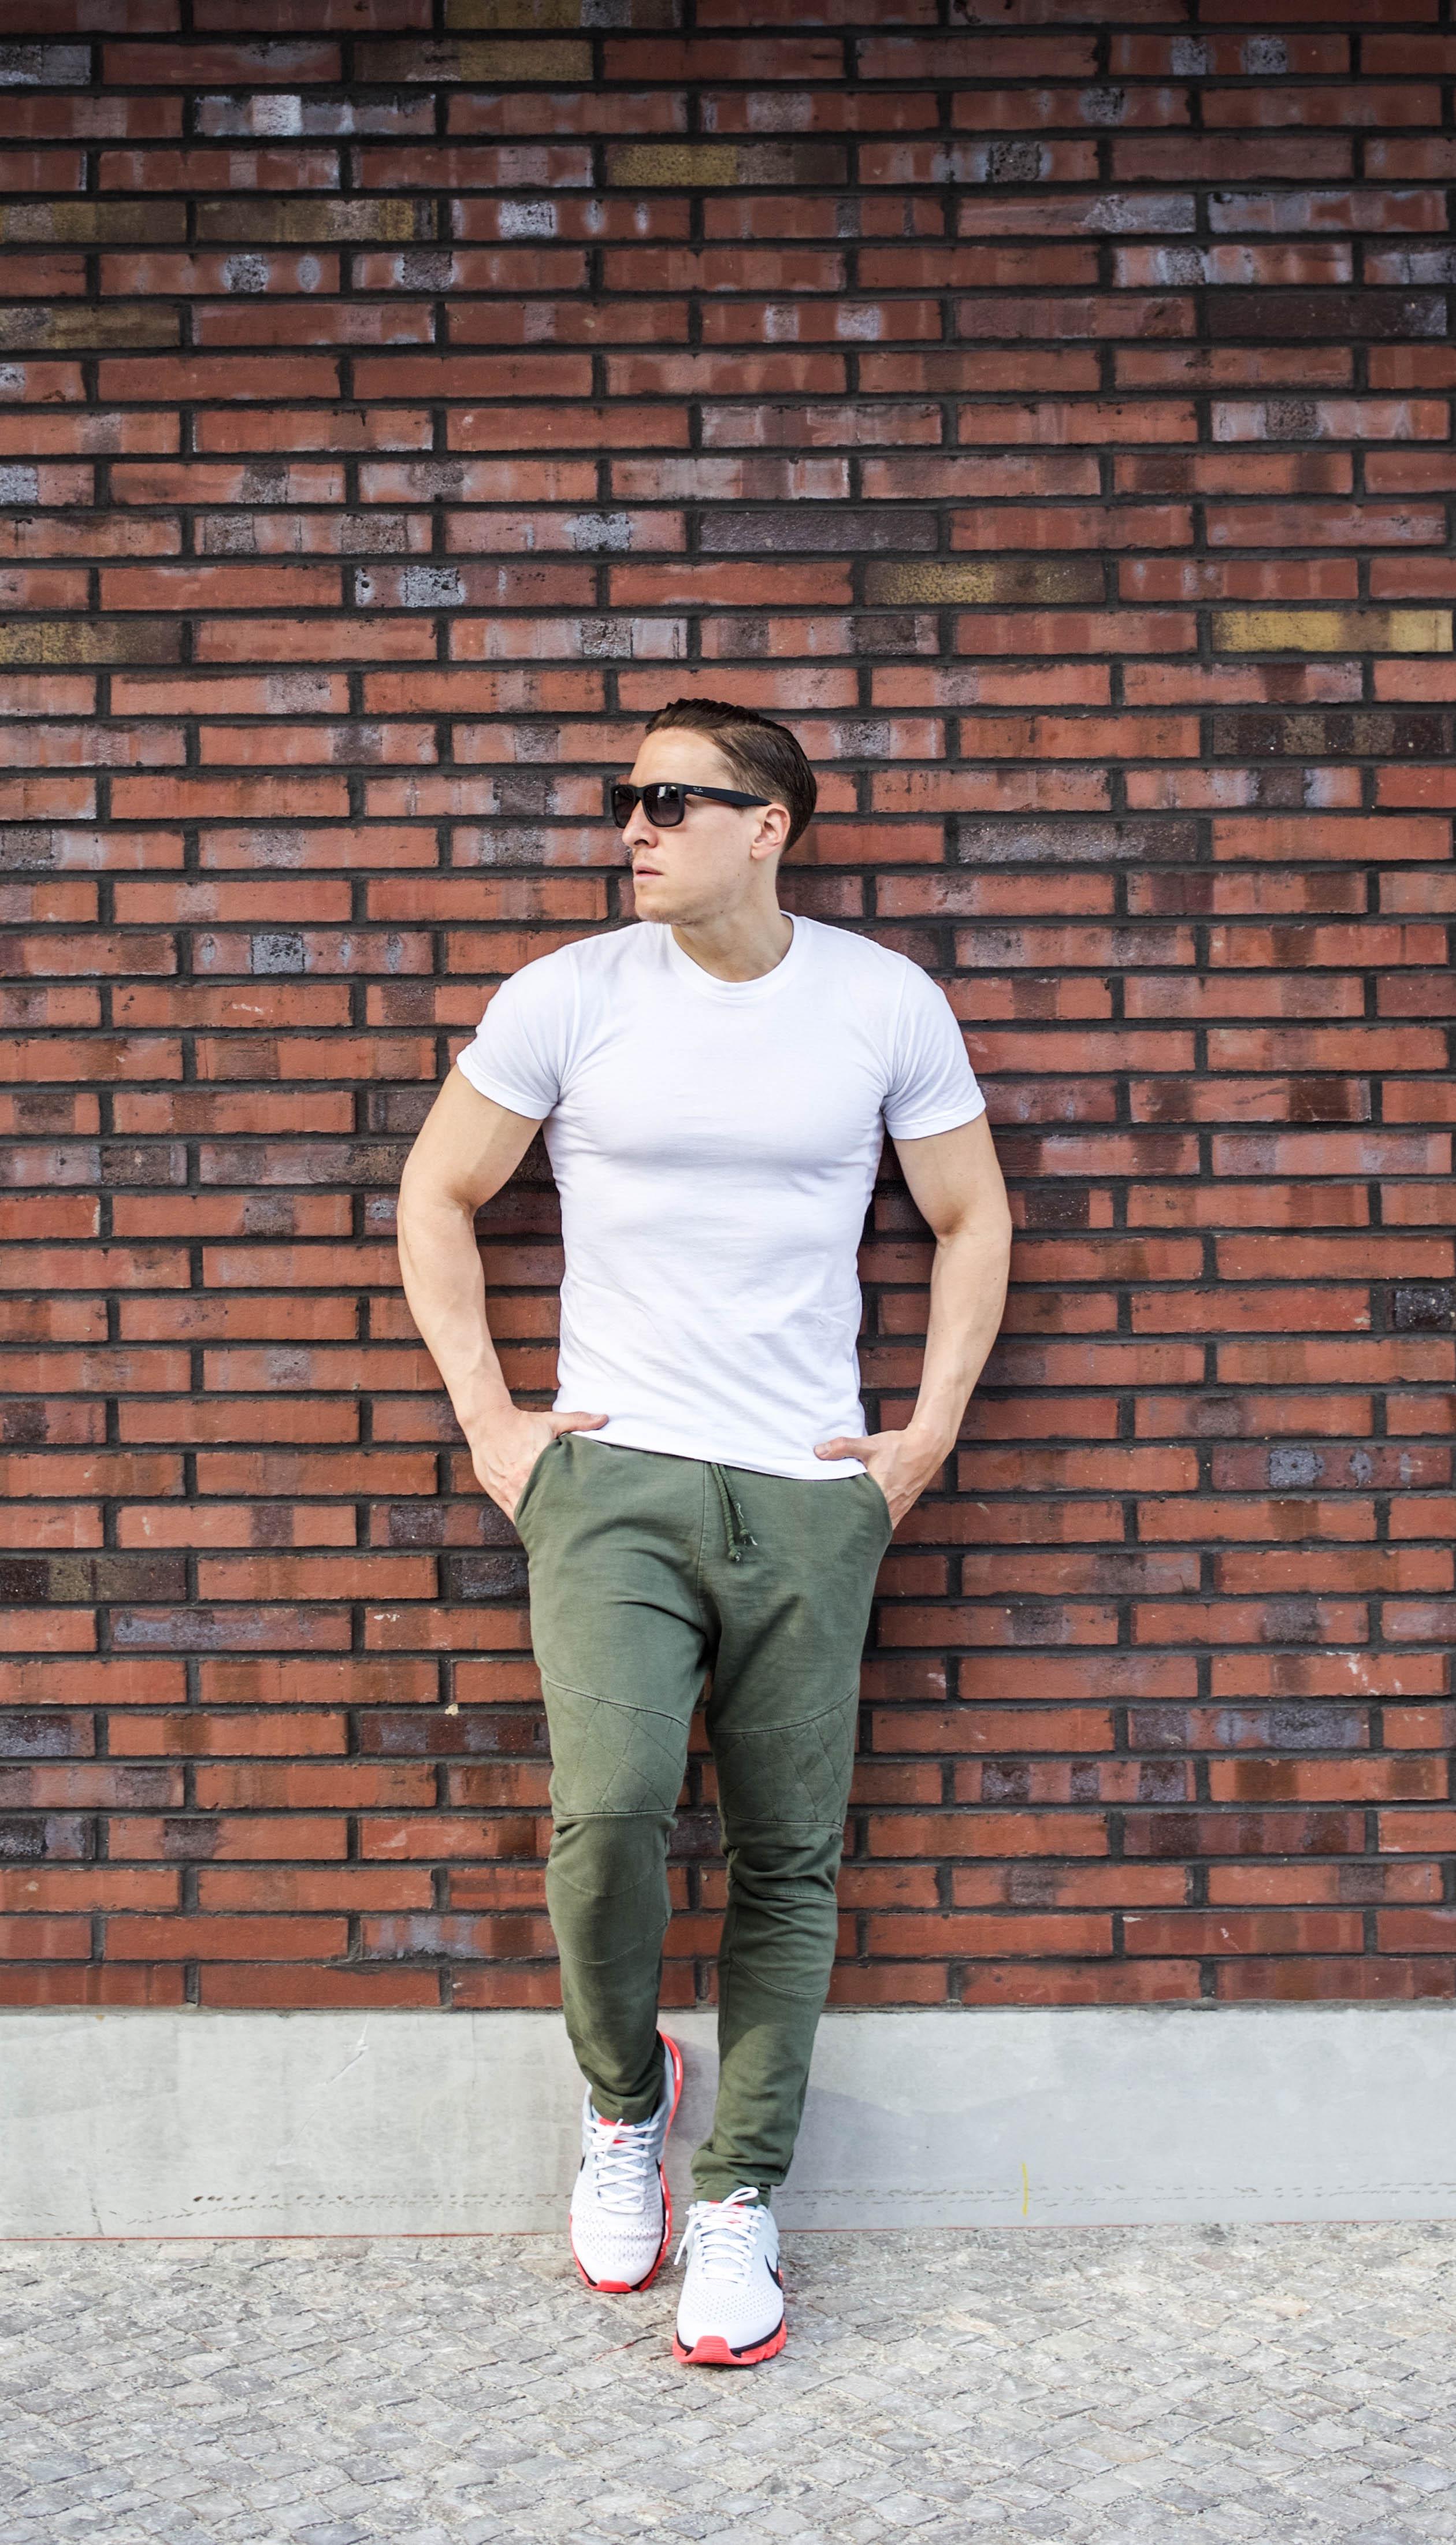 nike-air-max-2017-berlin-outfit-modeblog-lässiger-street-style-männerblog_6610